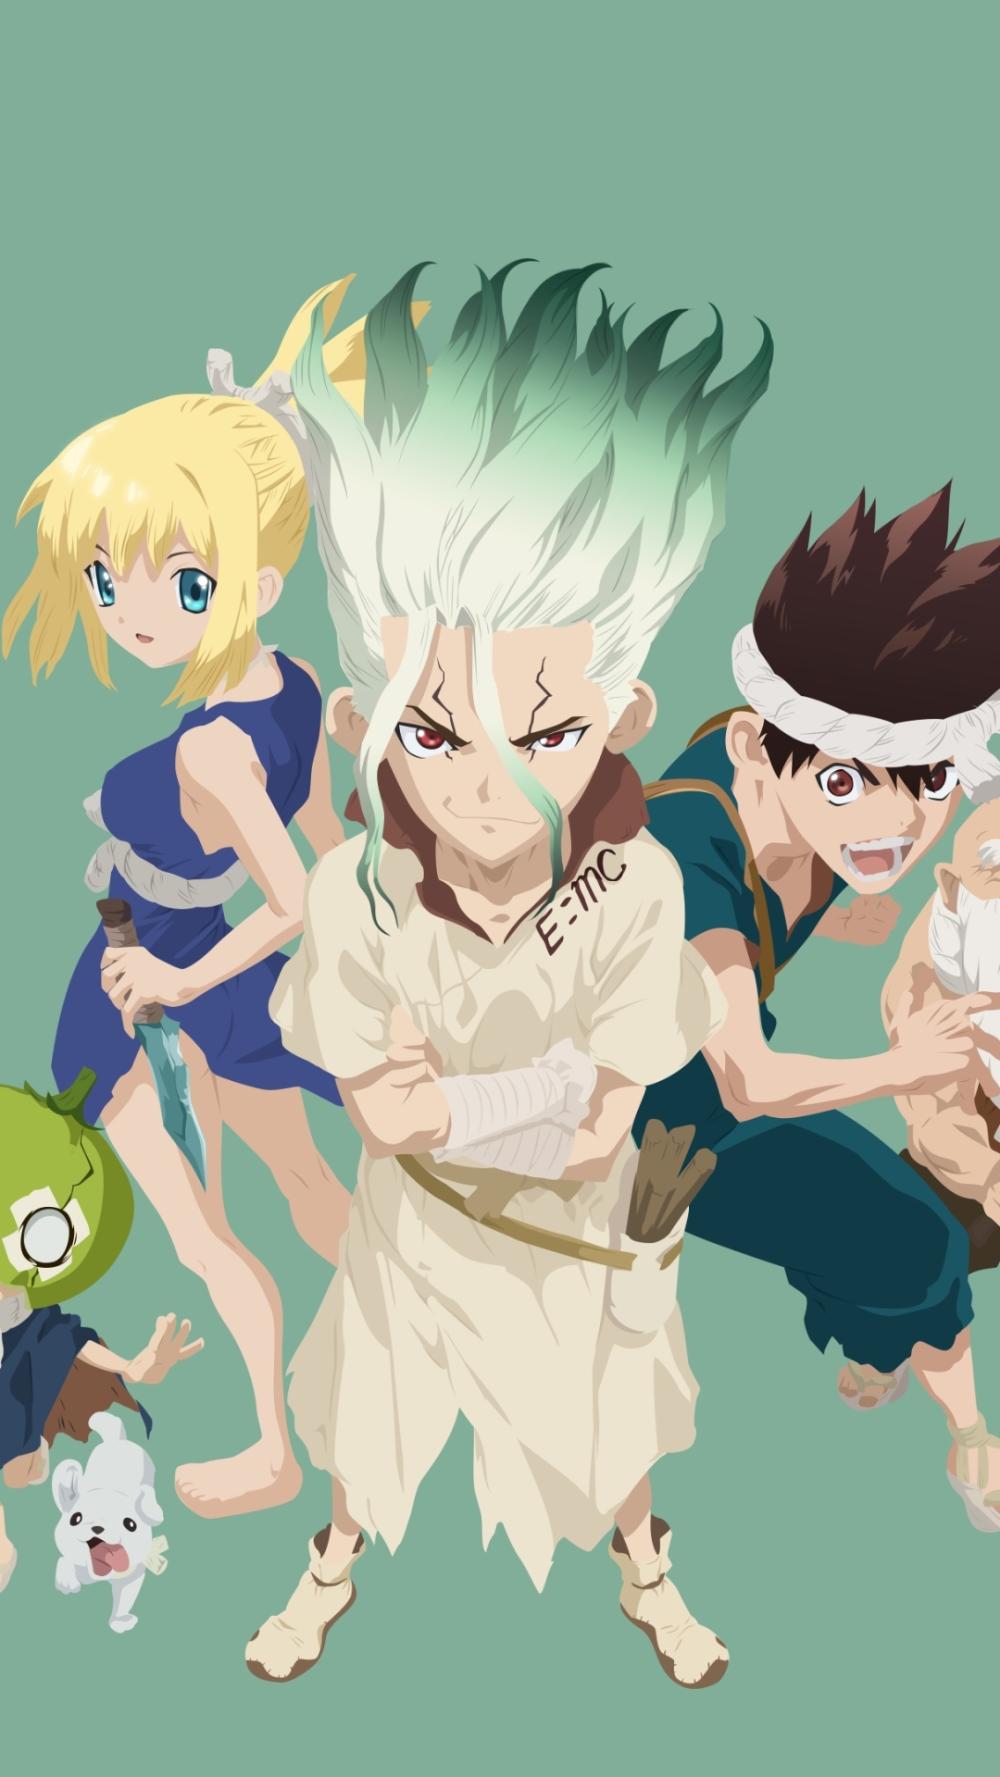 Anime Dr Stone Chrome Dr Stone Kohaku Dr Stone Senku Ishigami 1080x1920 Mobile Wallpaper Anime Anime Wallpaper Stone